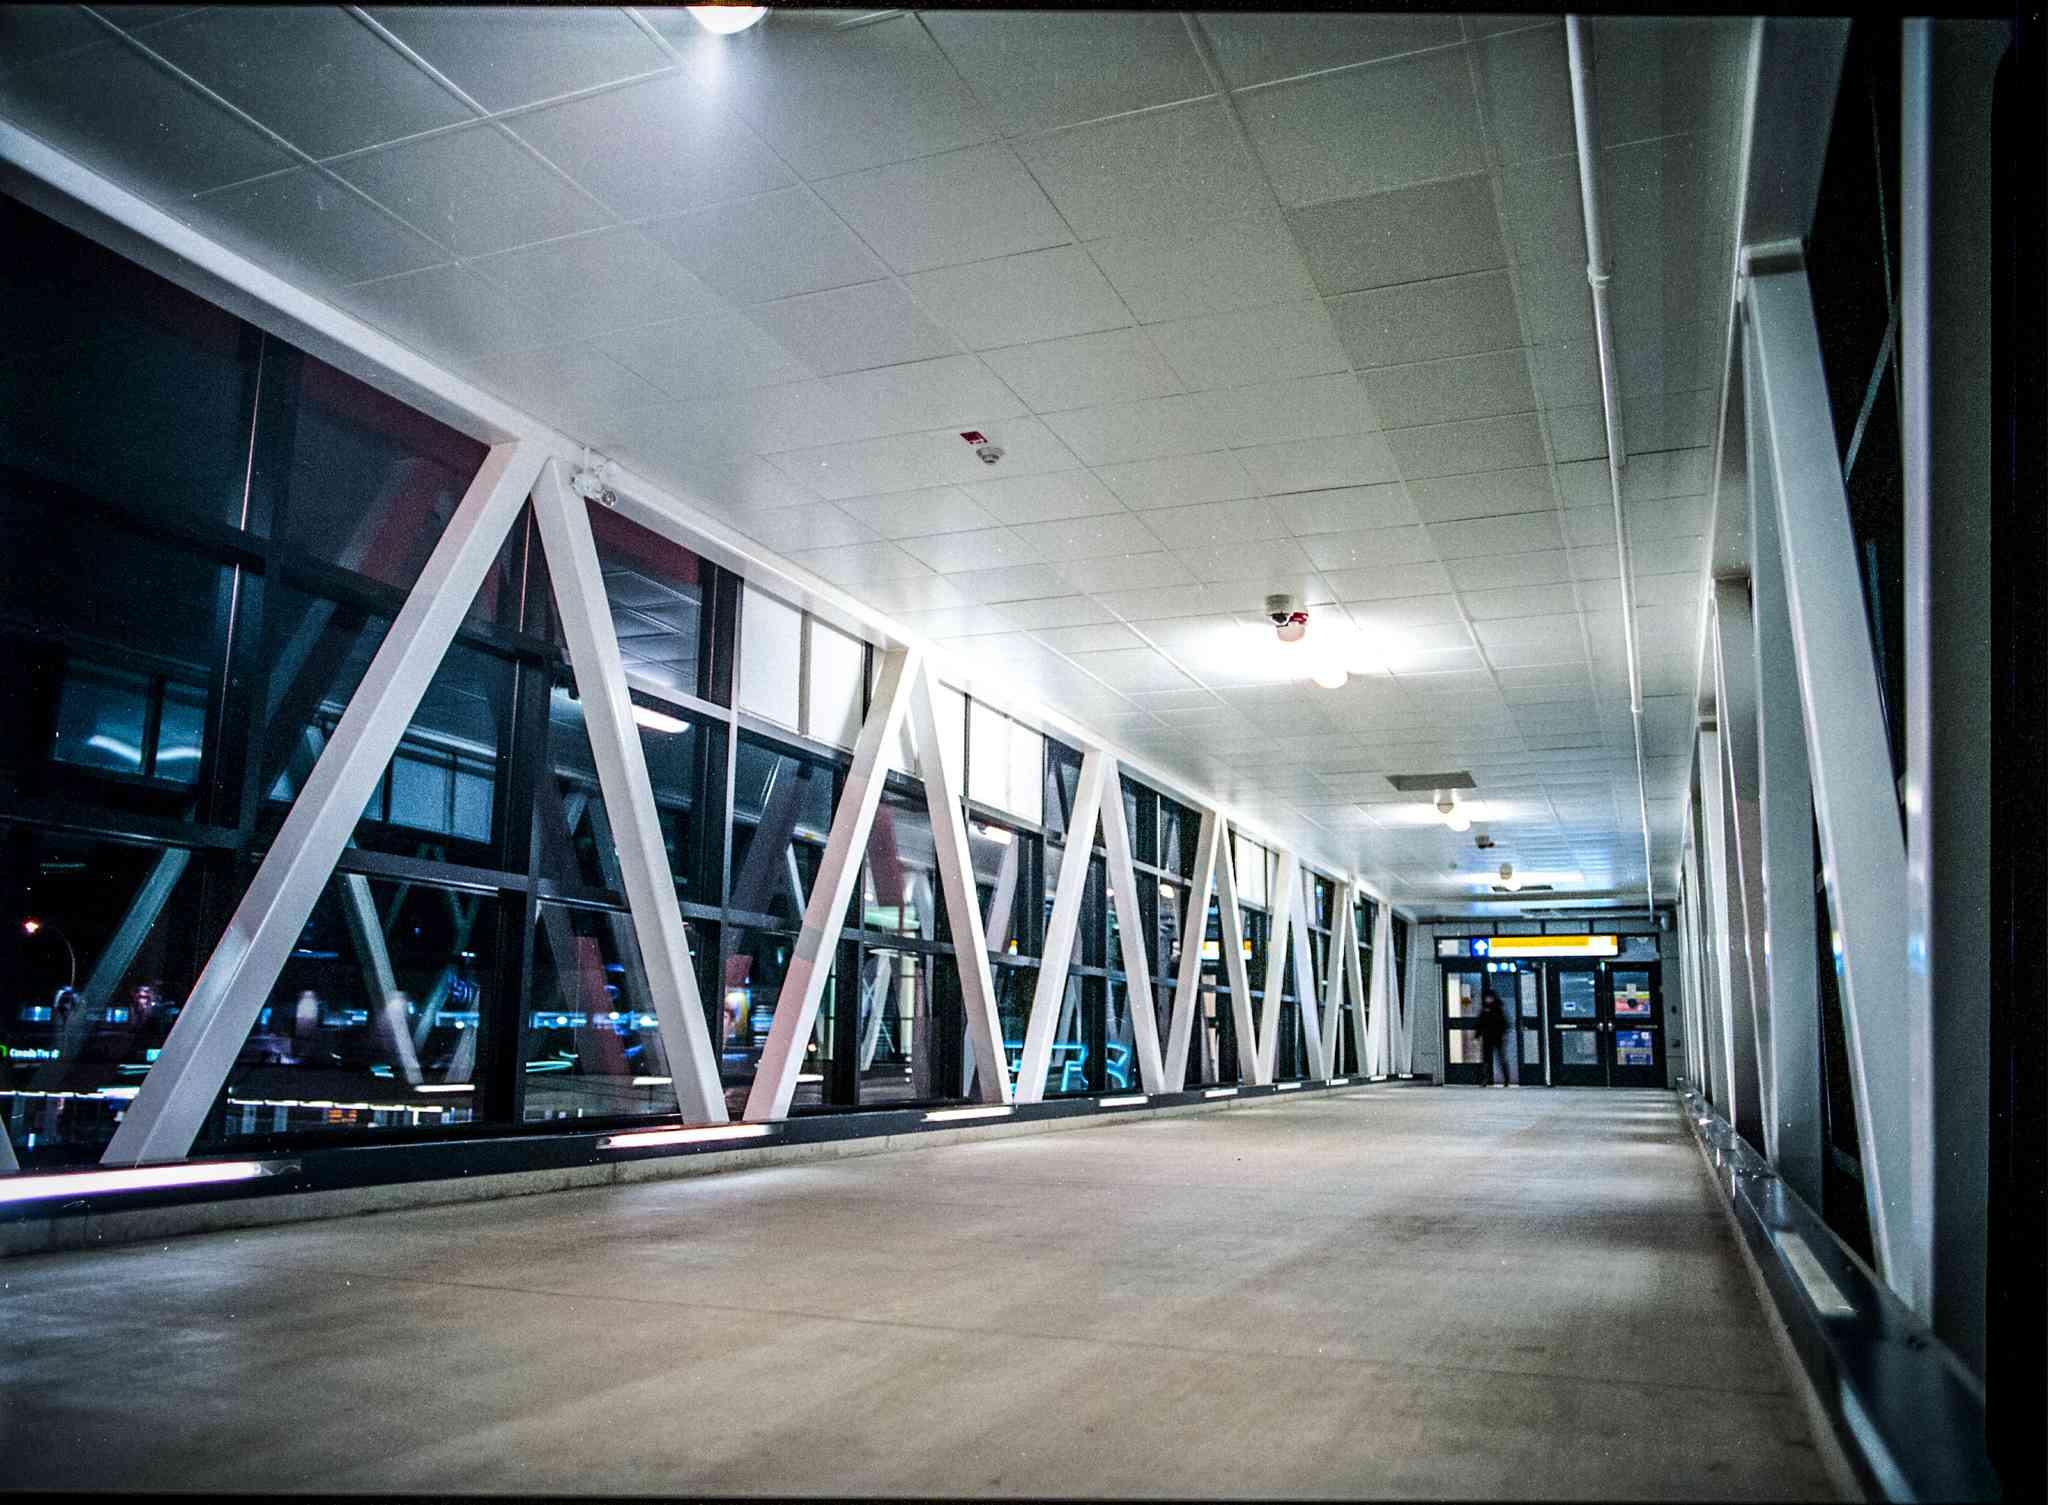 An Edmonton Pedway section at night.